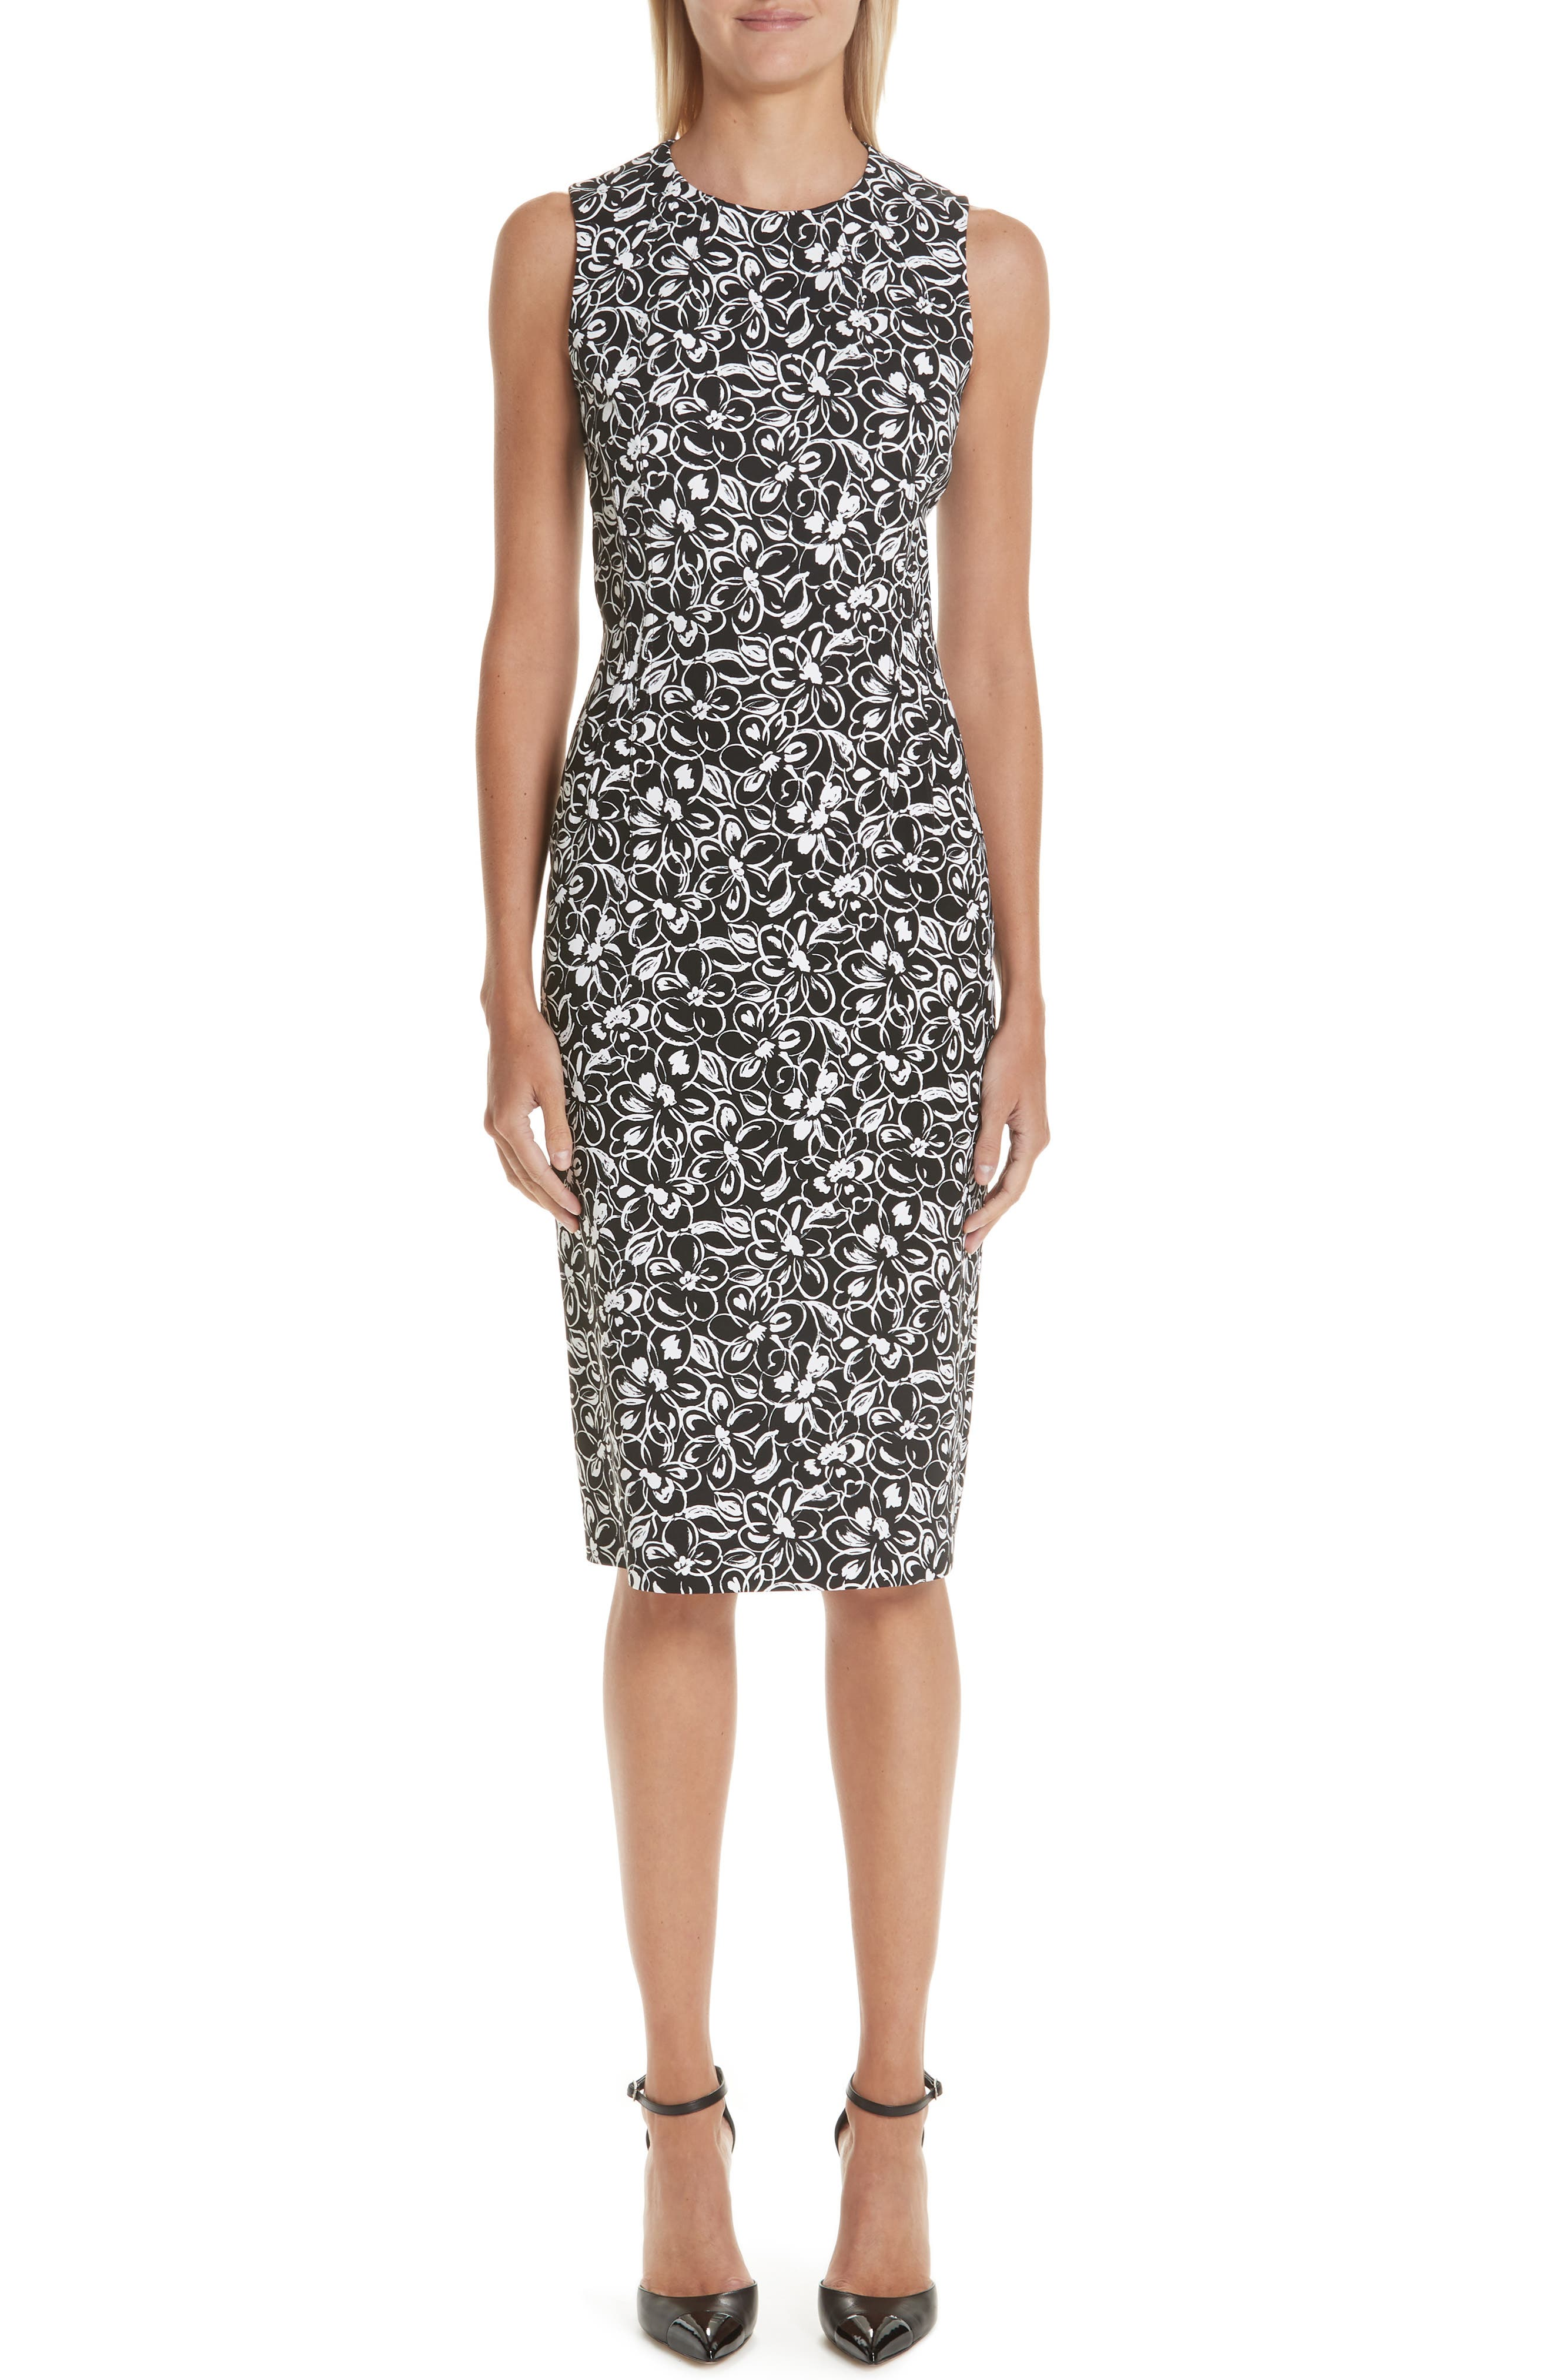 Michael Kors Painterly Floral Stretch Cady Sheath Dress, Black